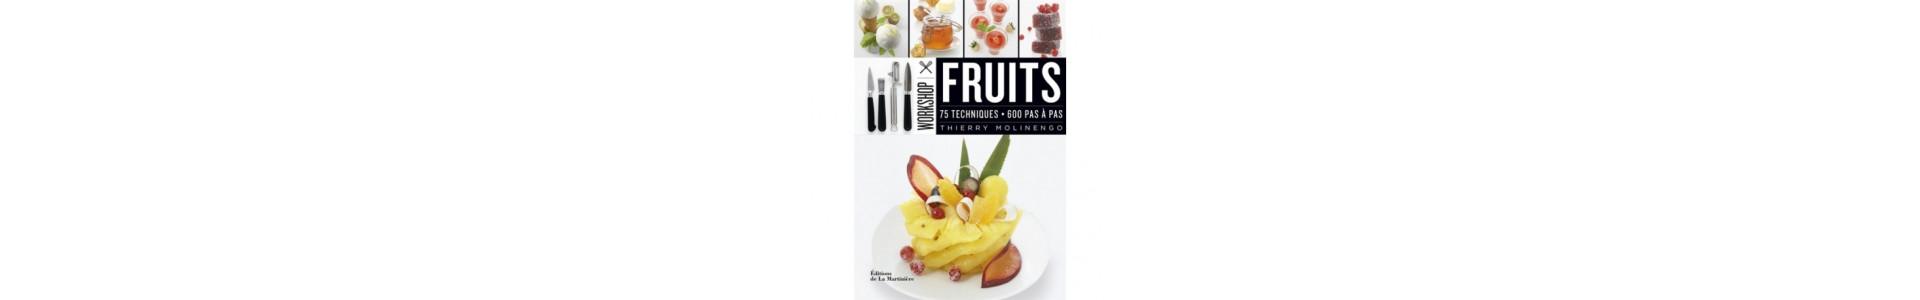 Livres de nos Chefs de Cuisine